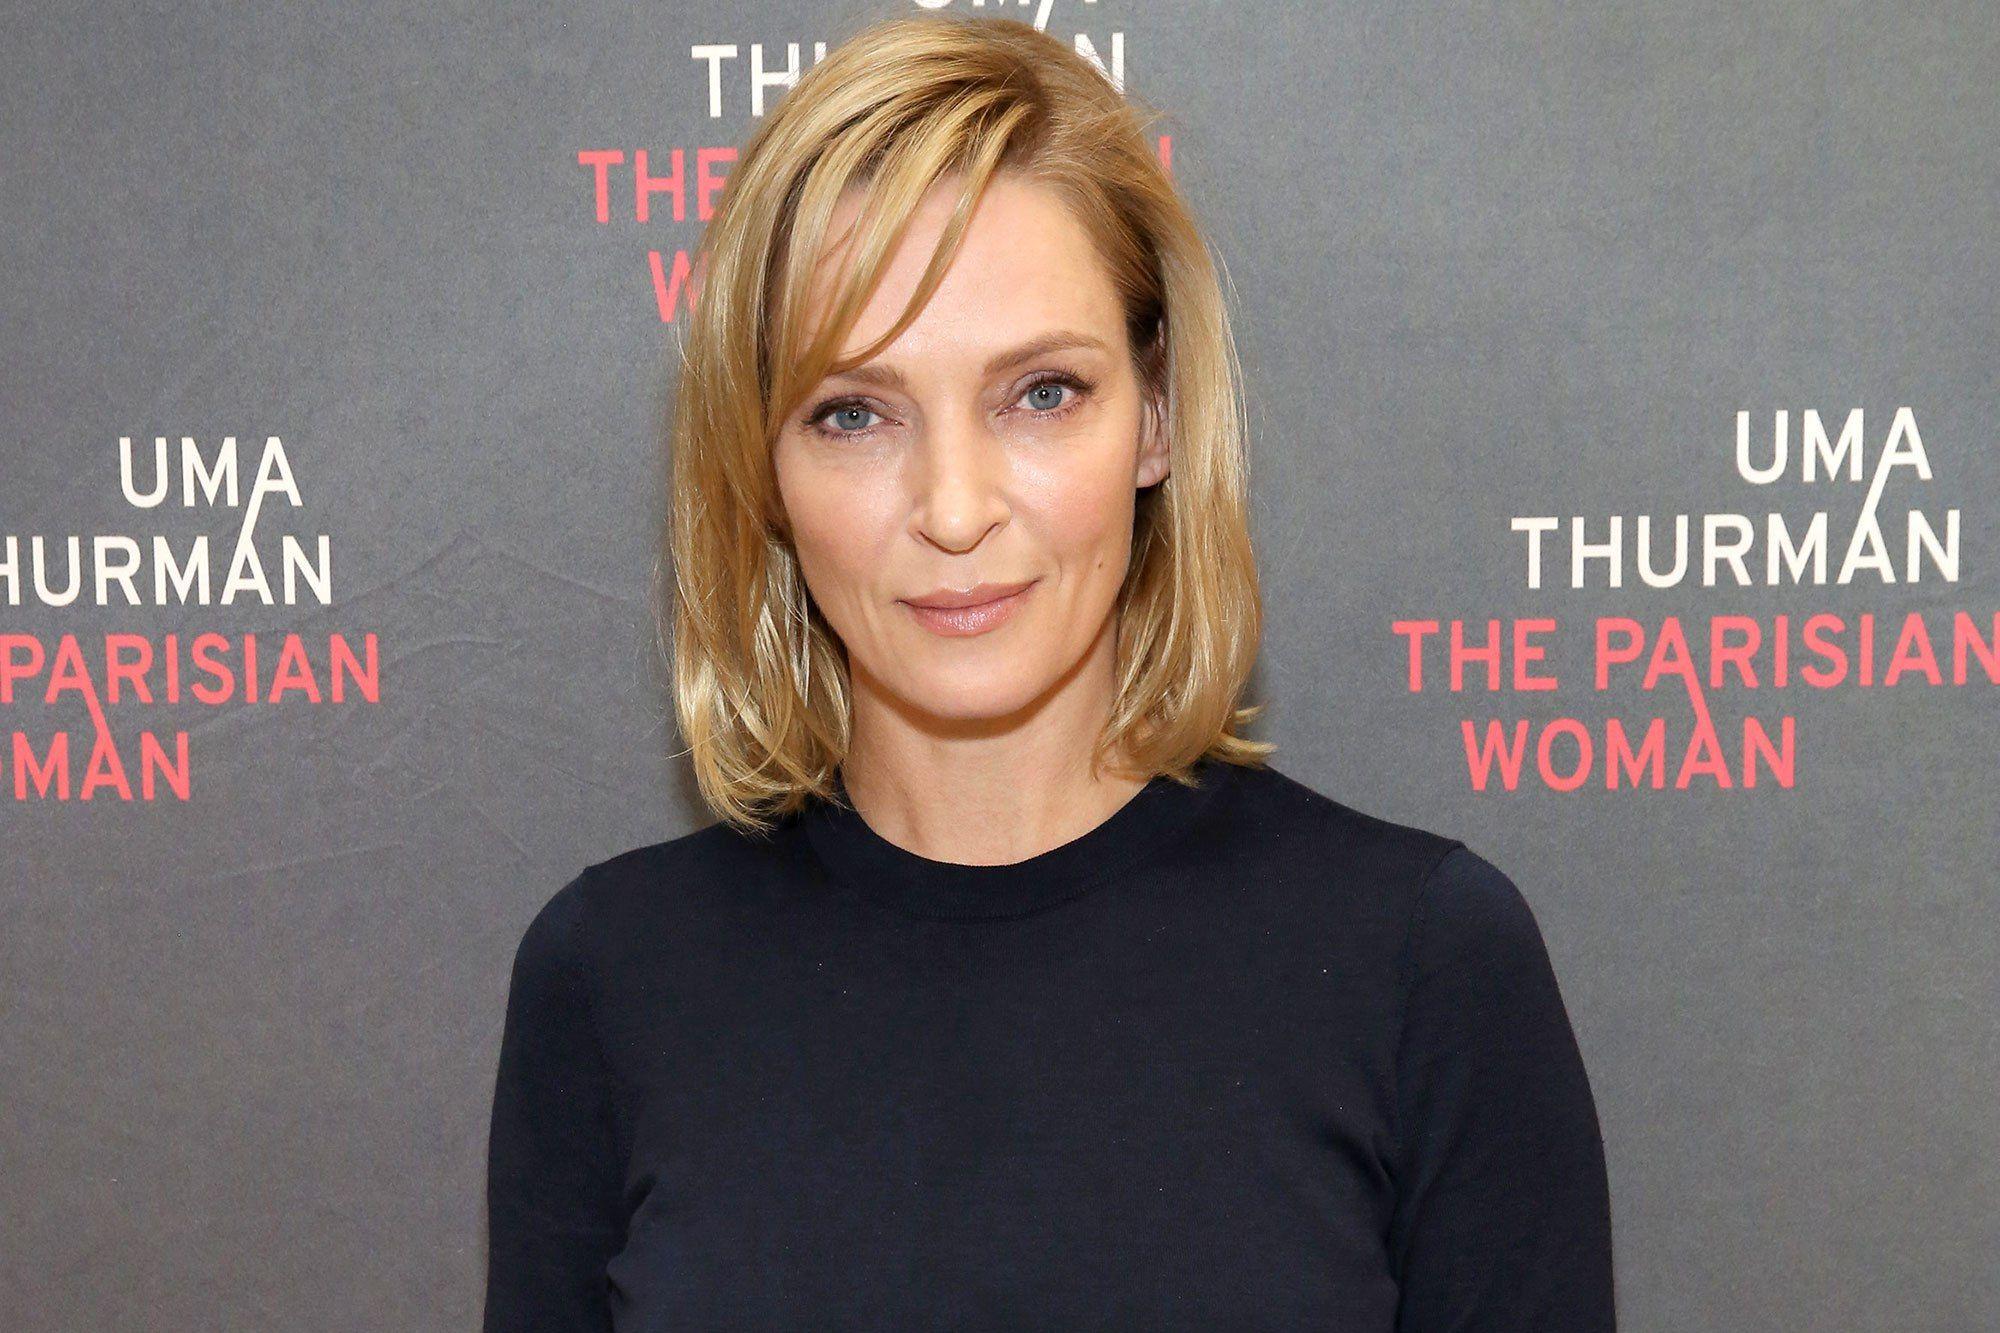 Uma Thurman sobre los abusos en Hollywood